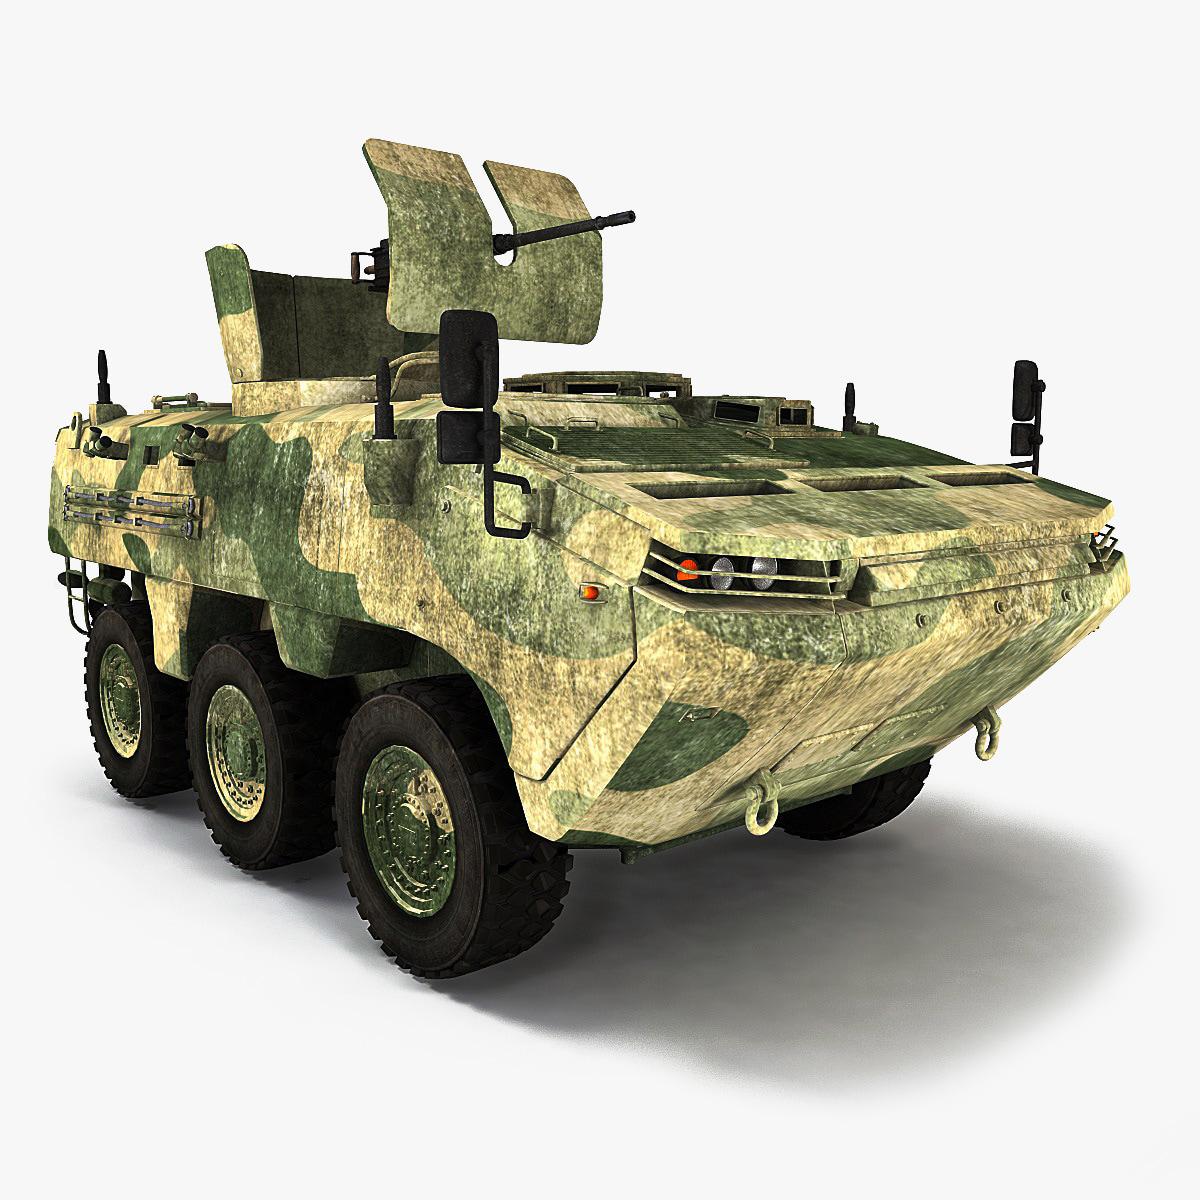 ARMA_6X6_Turkey_Armoured_Tactical_Vehicle_V2_00.jpg